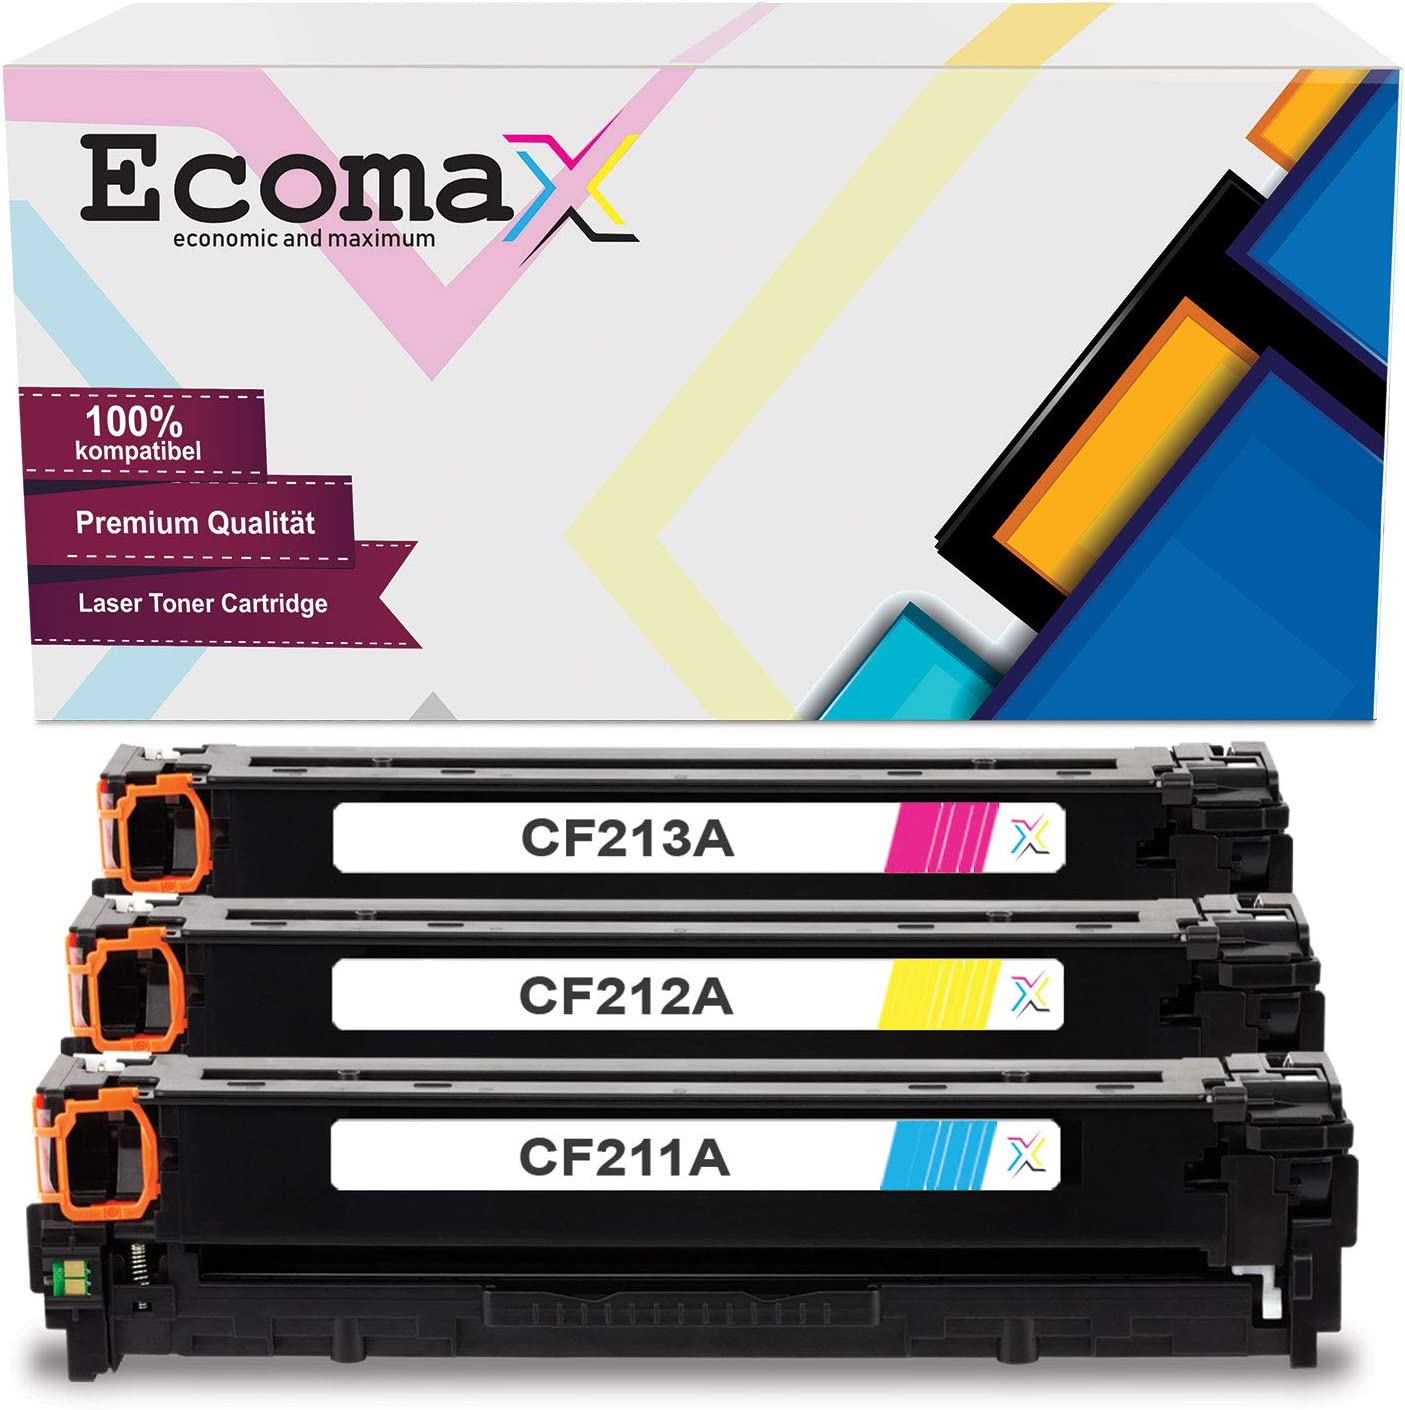 3 Ecomax Toner Kompatibel Zu Hp Cf211a Cf212a Cf213a 131a 131x Für Hp Laserjet Pro 200 Color Mfp M276n M276nw M251n M251nw Bürobedarf Schreibwaren